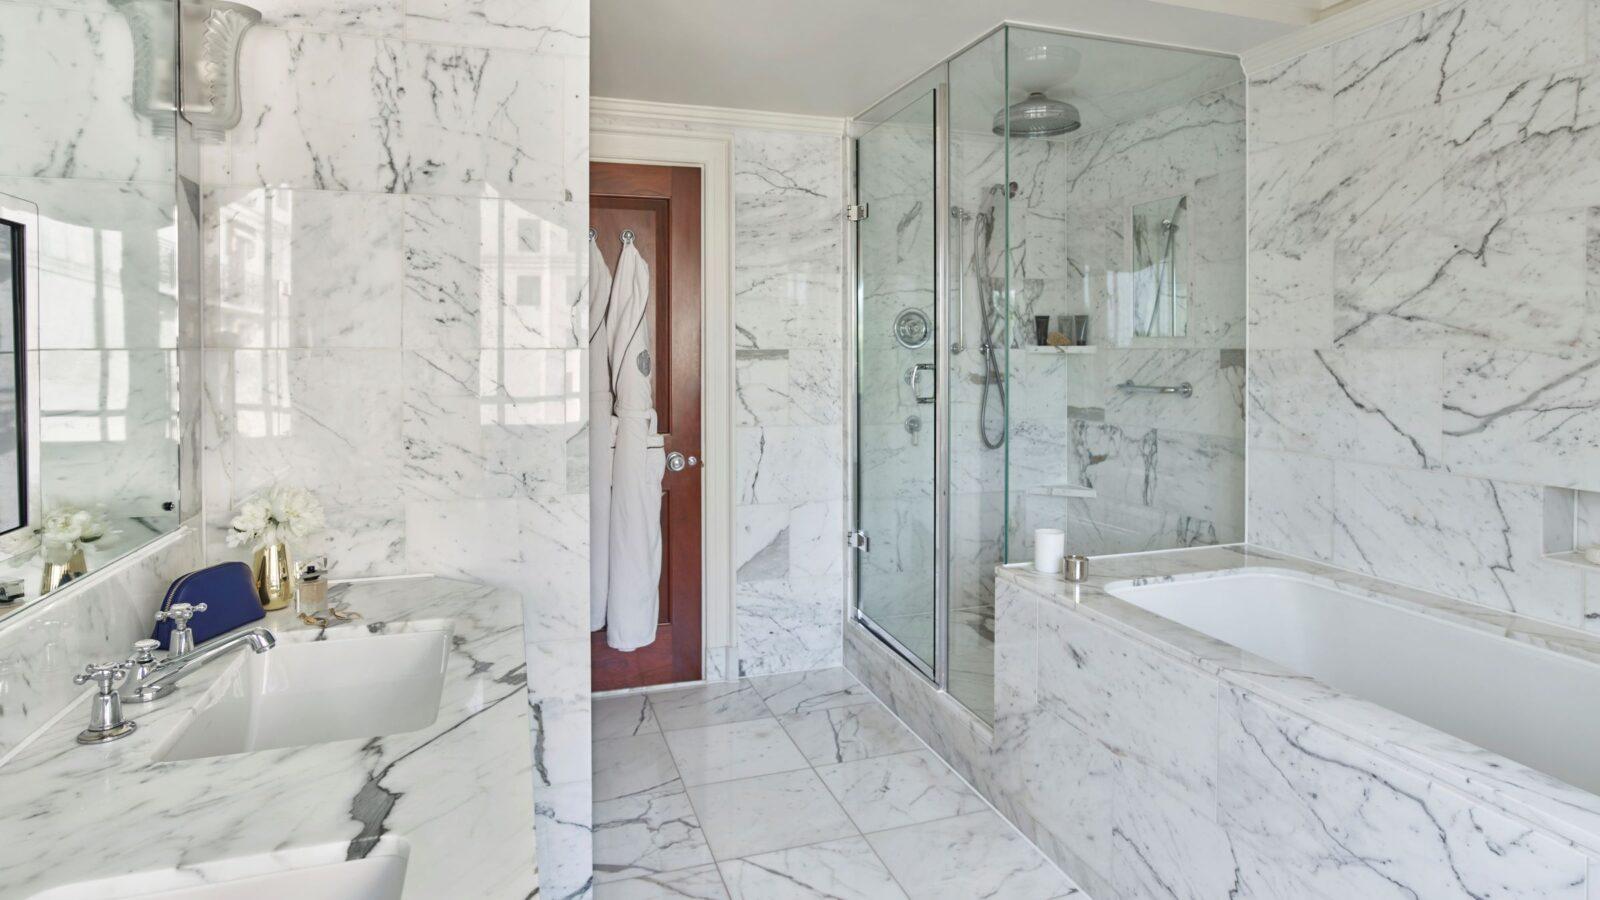 Bathrooms of uncommon delight